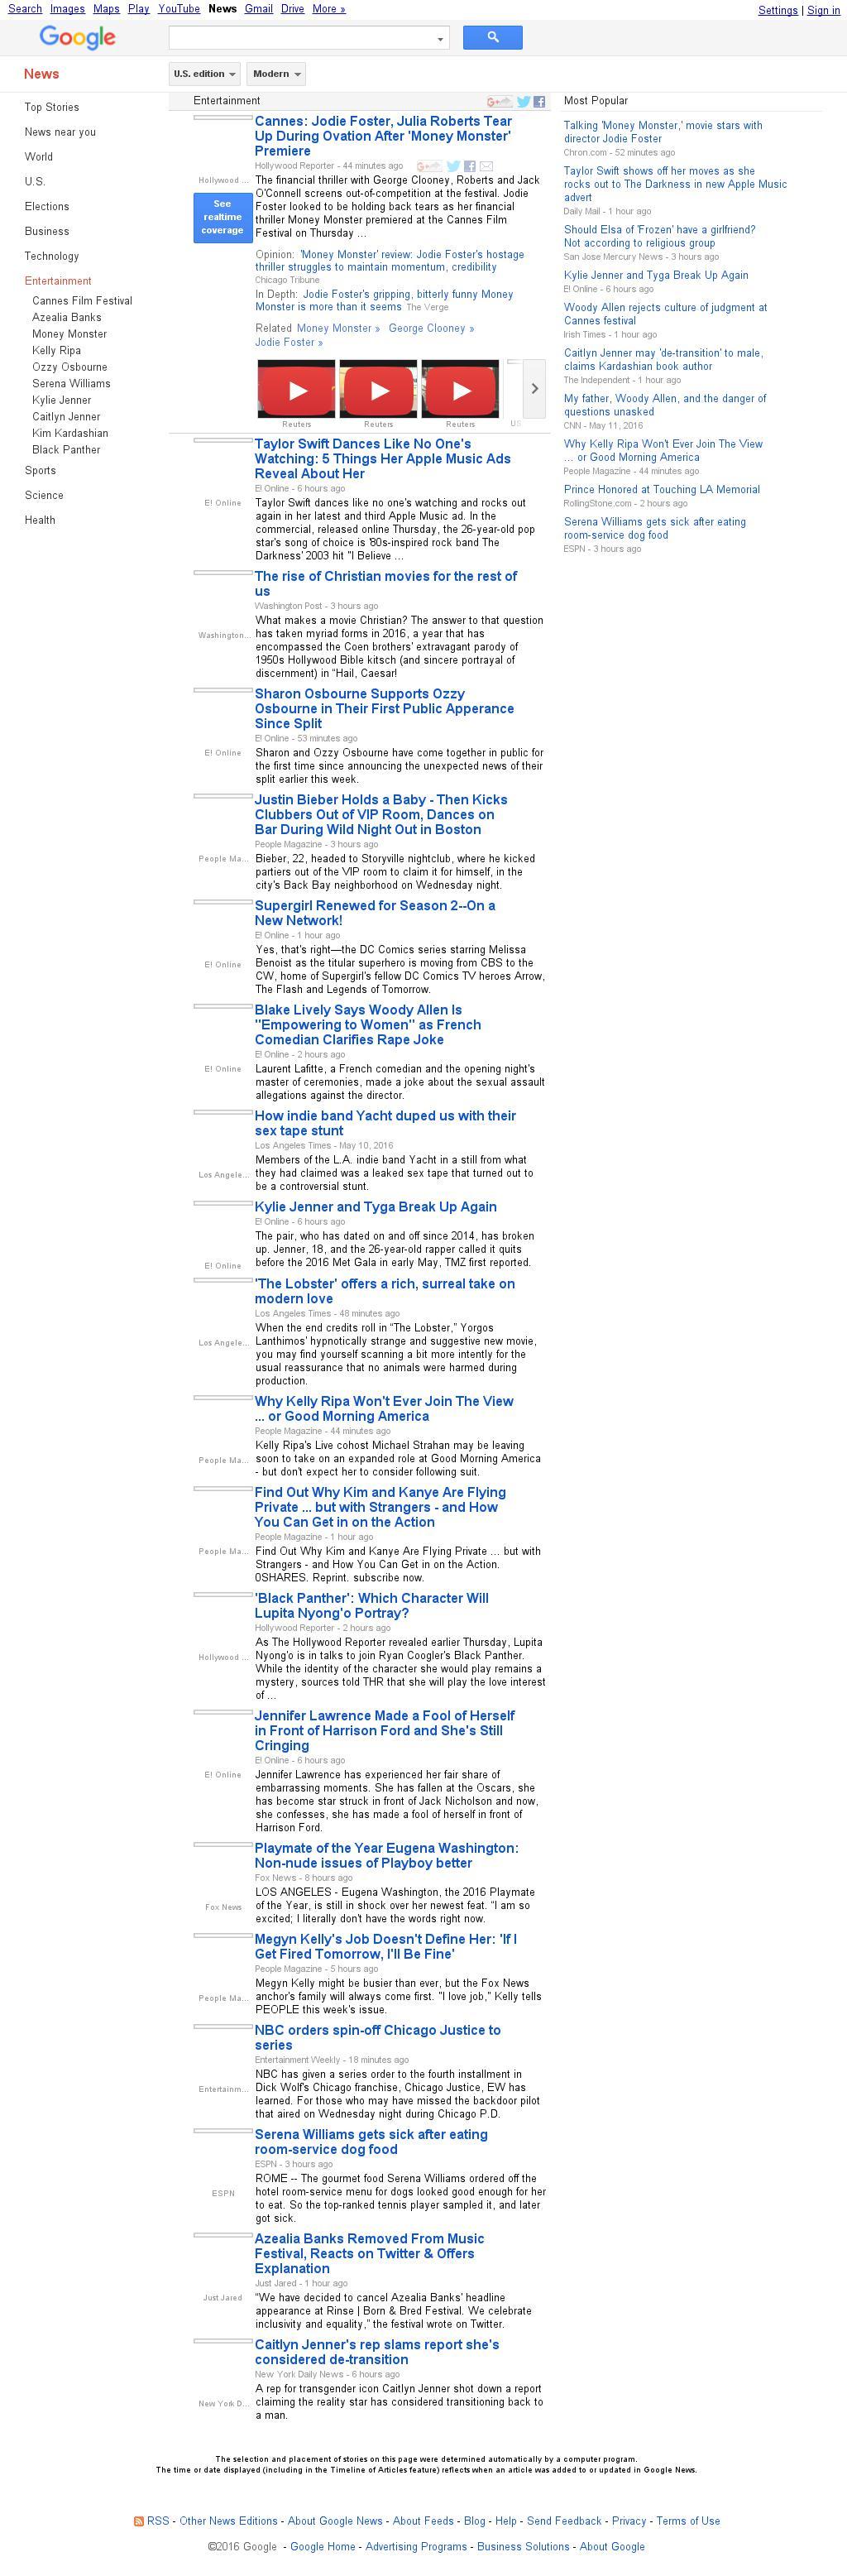 Google News: Entertainment at Thursday May 12, 2016, 10:08 p.m. UTC